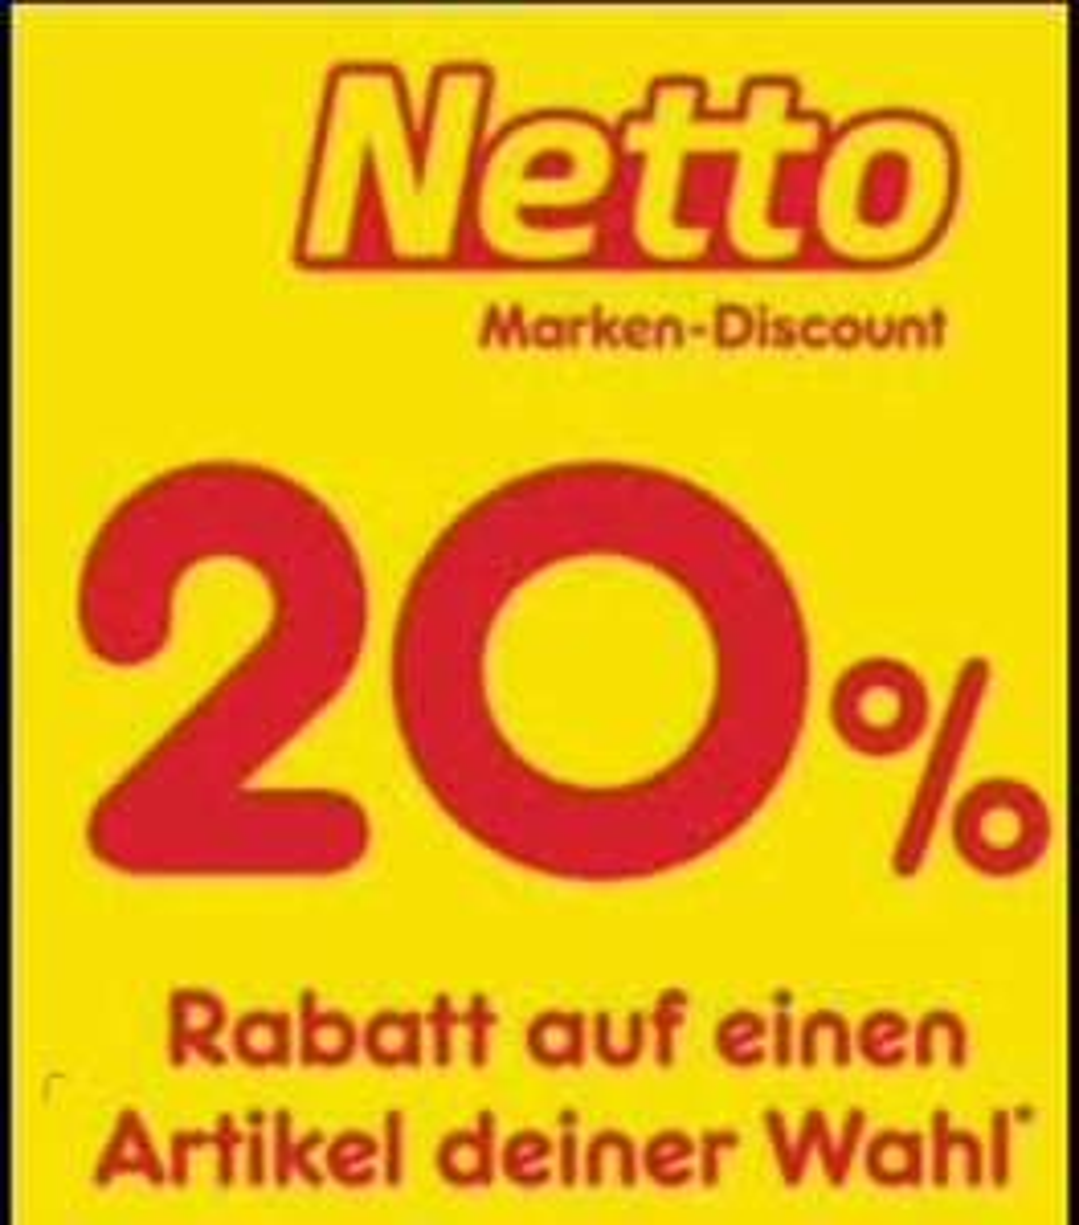 [Netto MD] Rabatt Coupons KW24 (14.06. - 19.06.), bundesweit einsetzbar